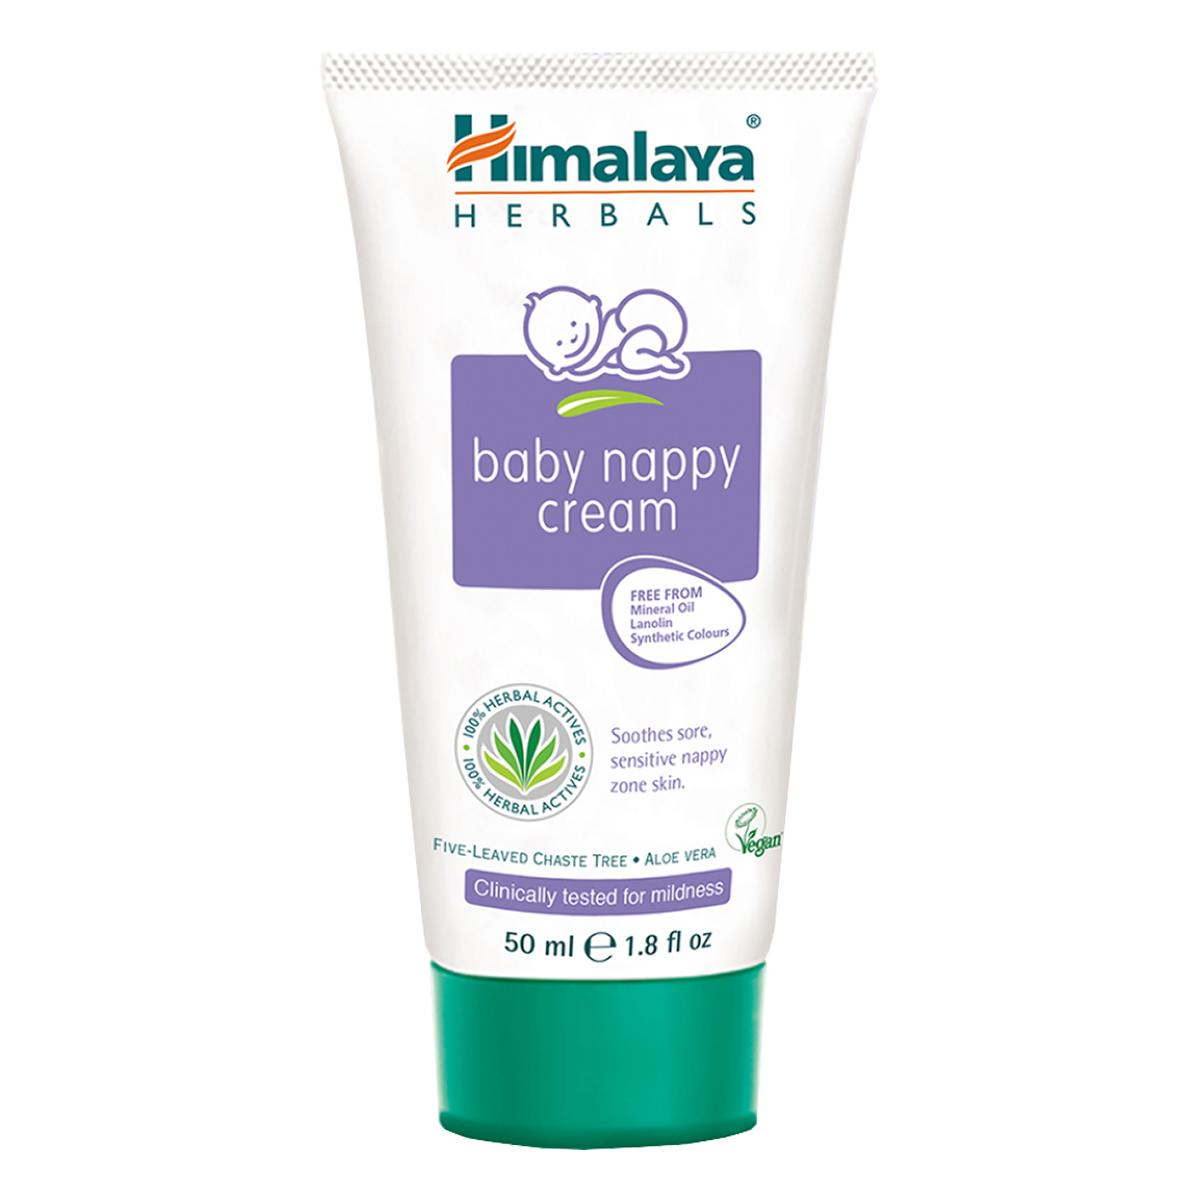 Crema pentru bebelusi Himalaya Baby, 50 ml imagine